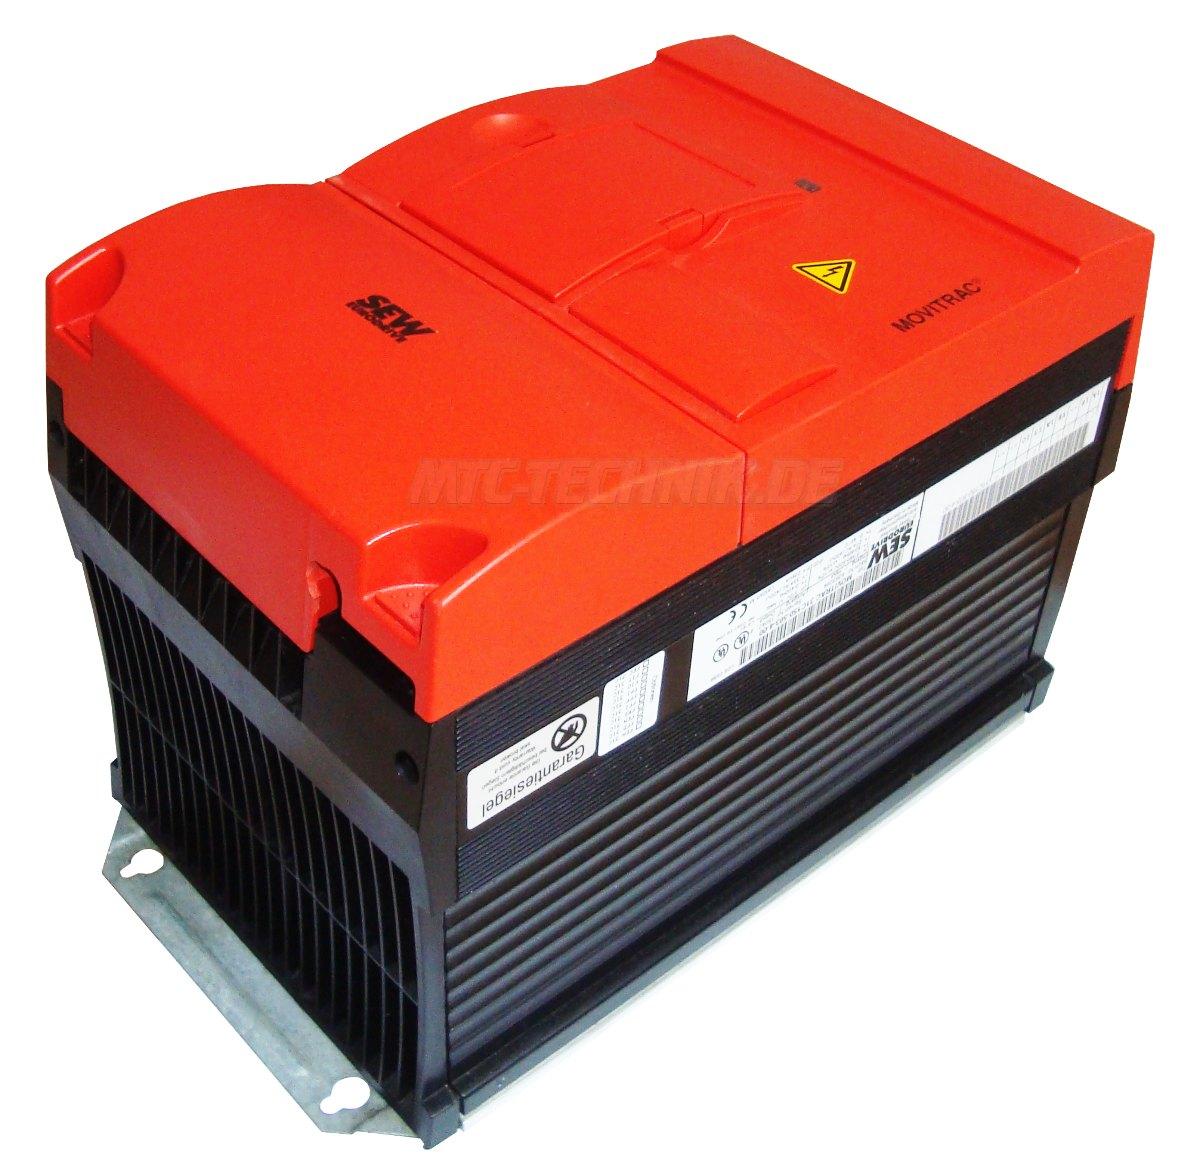 3 Sew Exchange 31c150-503-4-00 Frequency Inverter